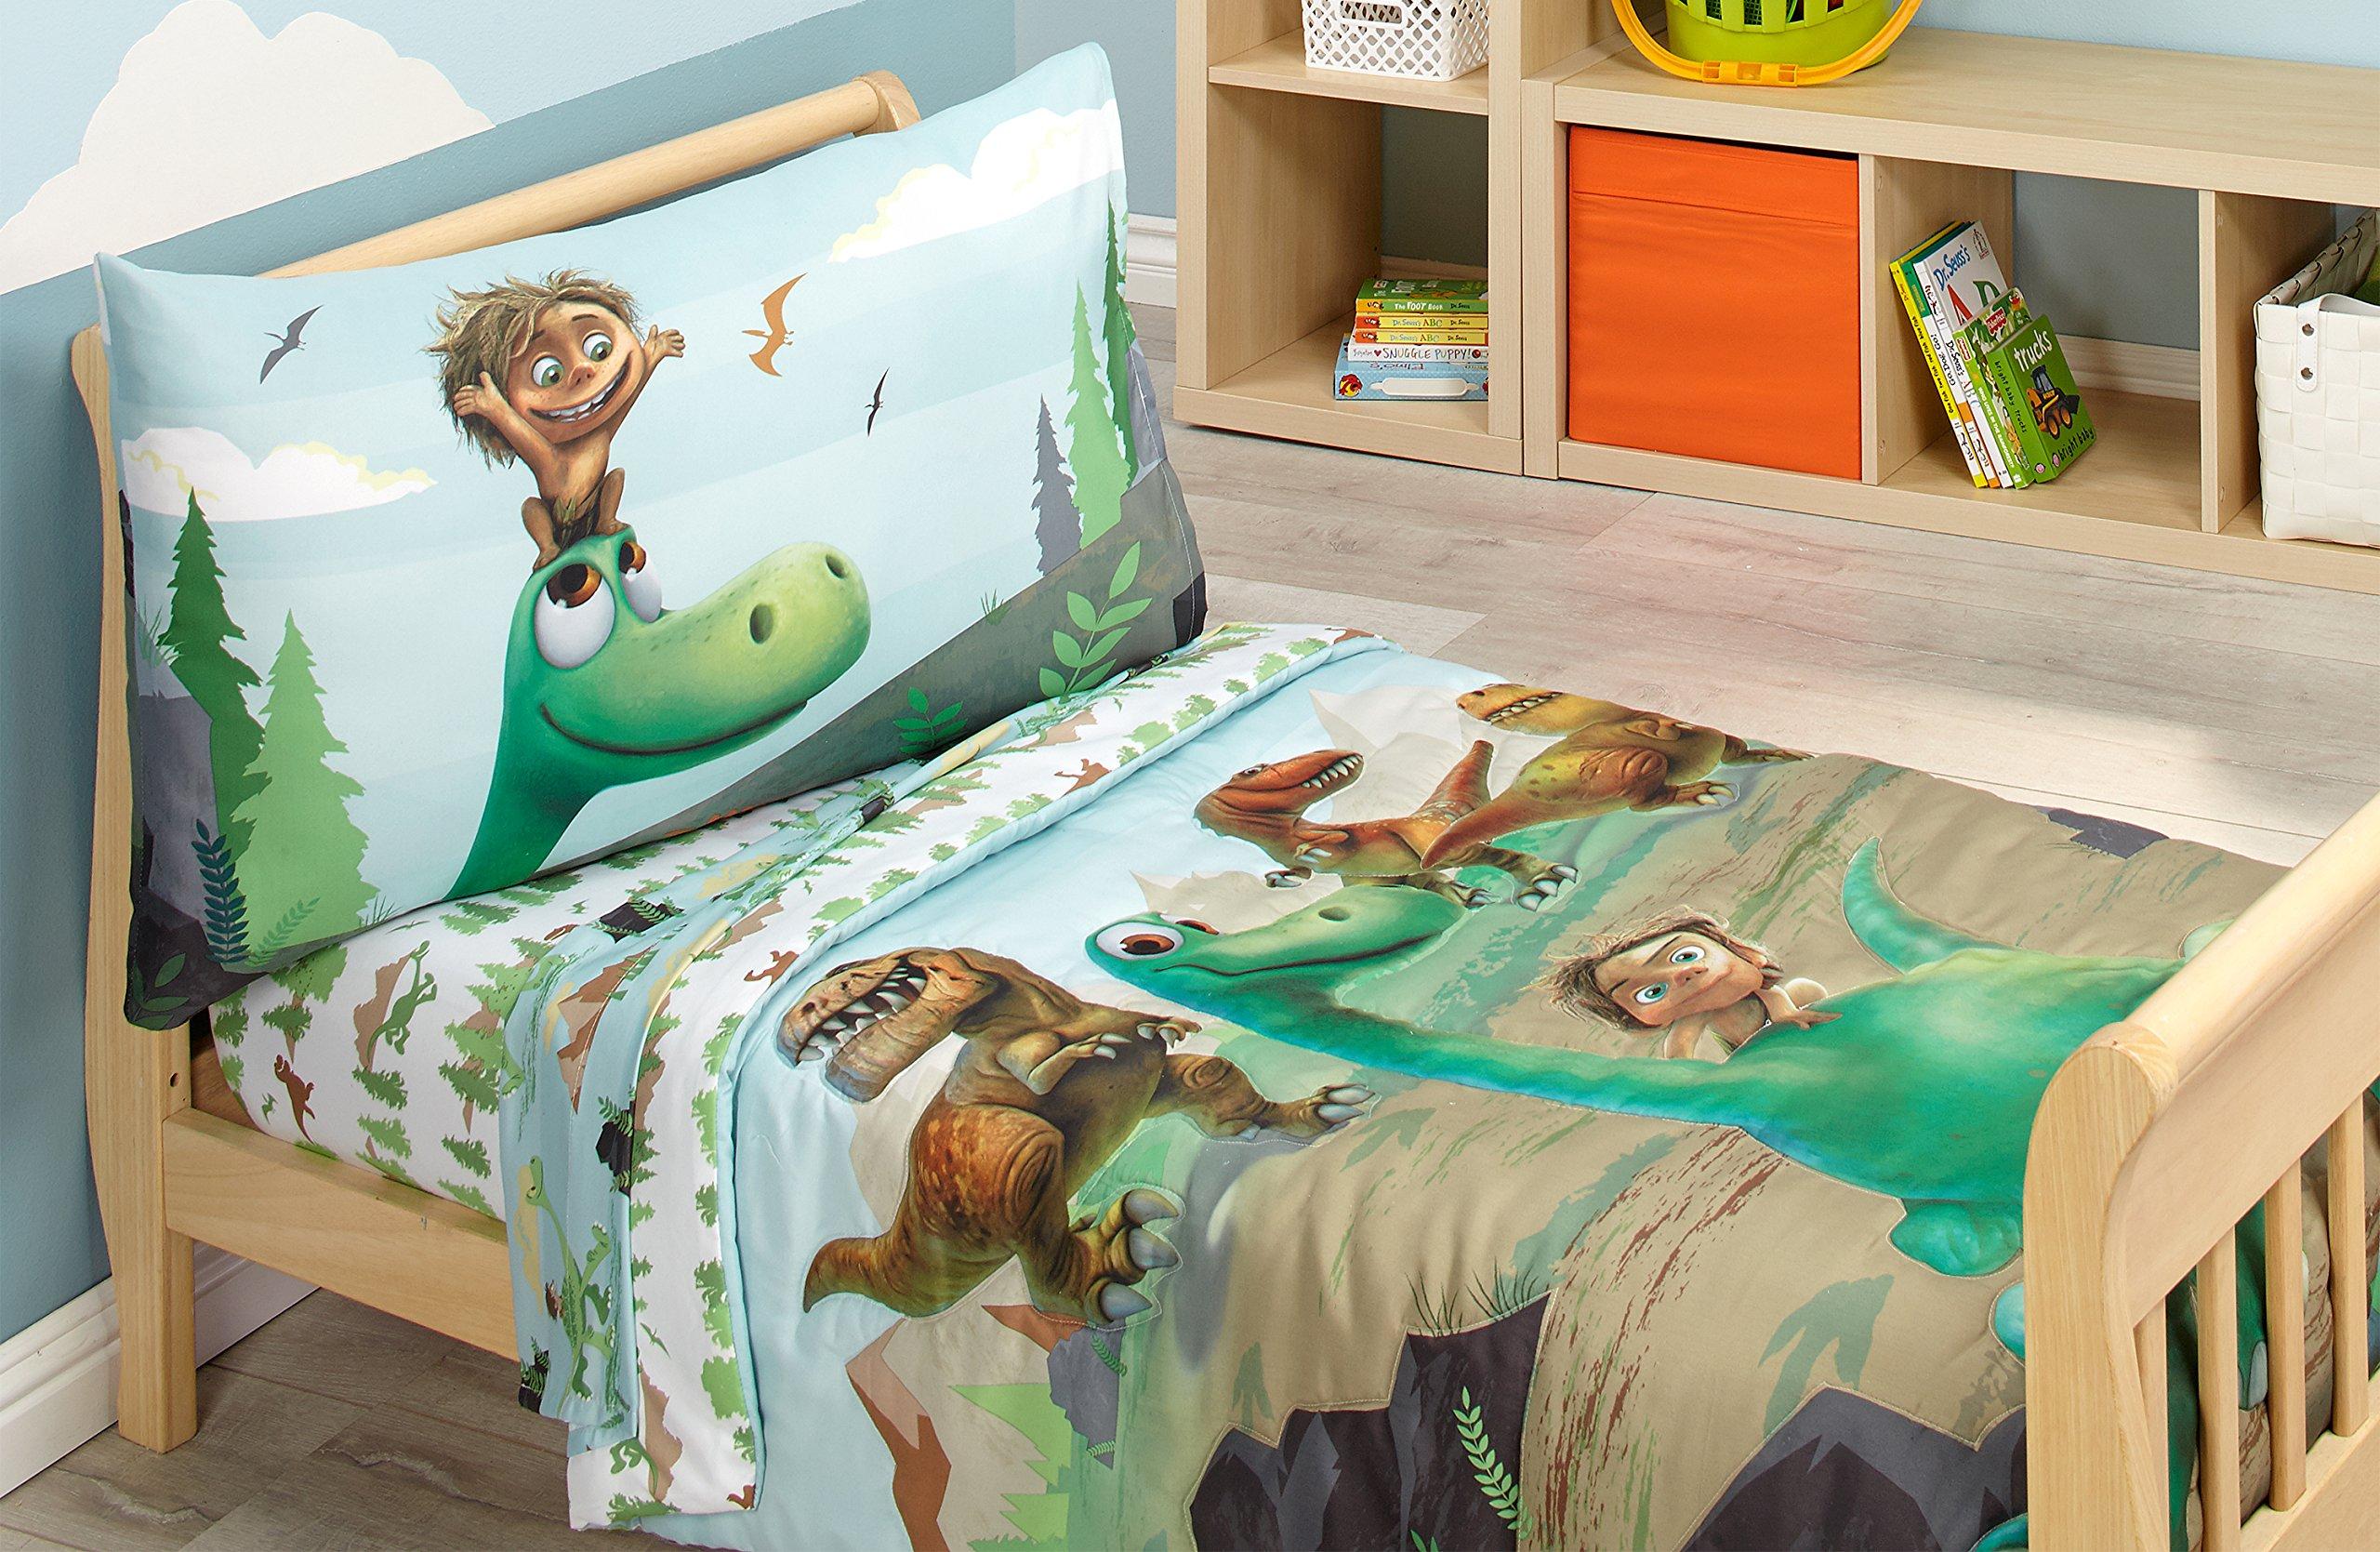 Disney Prehistoric Footprints 4 Piece Toddler Bed Set, The Good Dinosaur